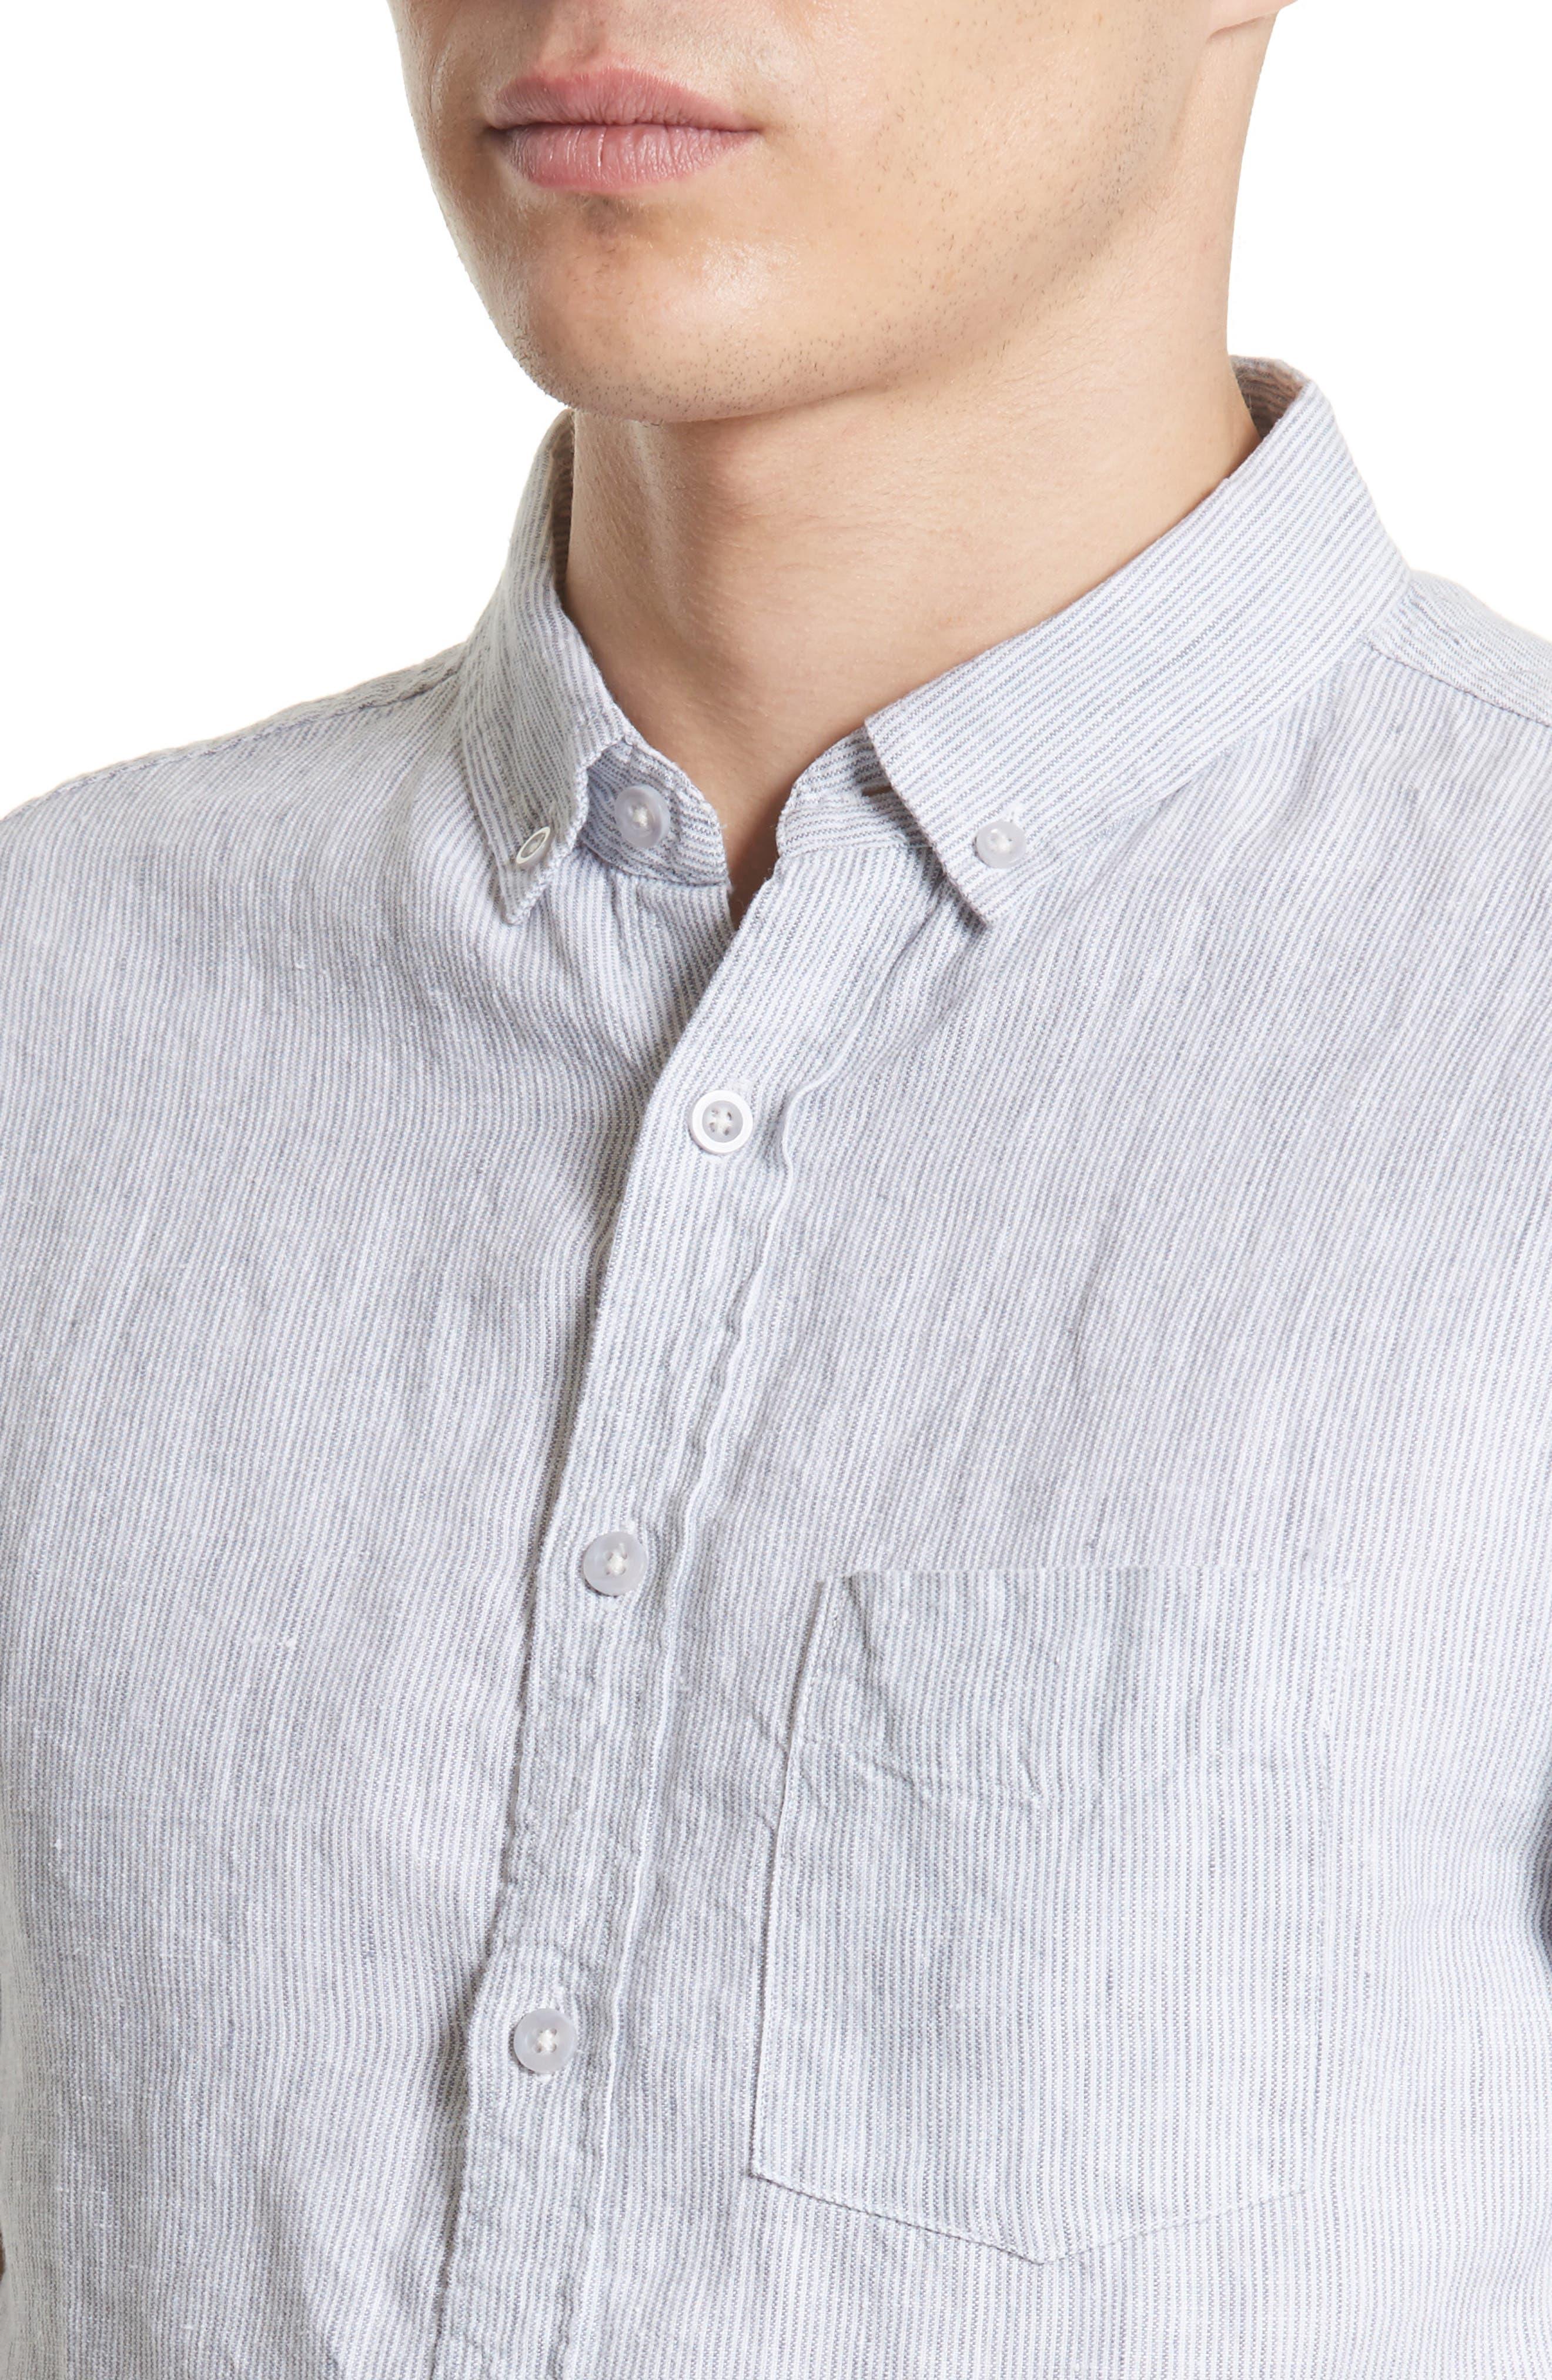 Trim Fit Microstripe Linen Shirt,                             Alternate thumbnail 5, color,                             100